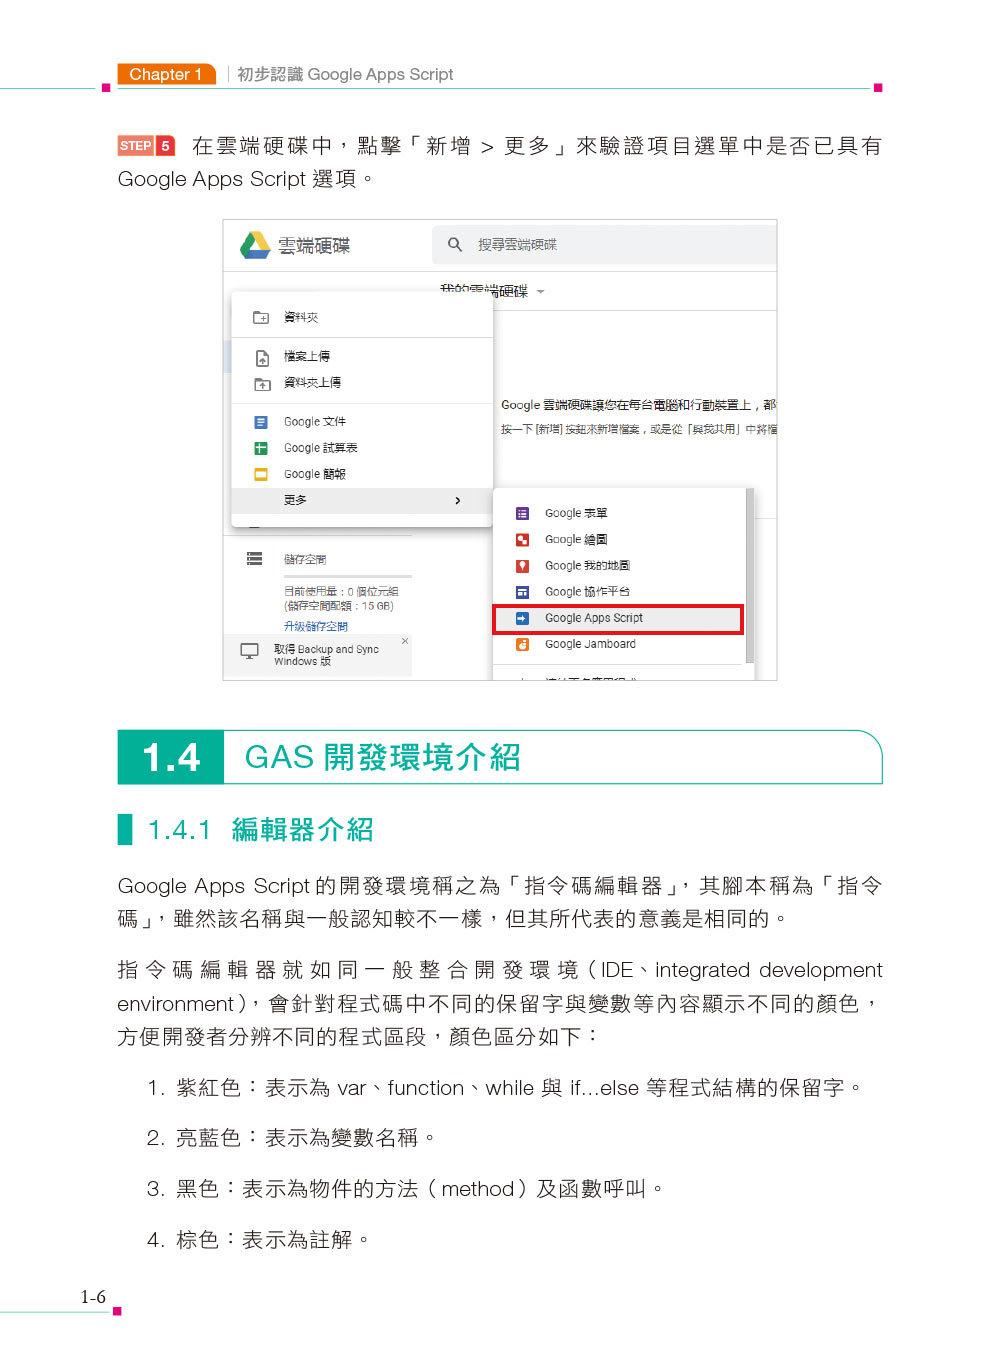 Google Apps Script 雲端自動化與動態網頁系統實戰 (附320分鐘影音教學/範例程式碼)-preview-1